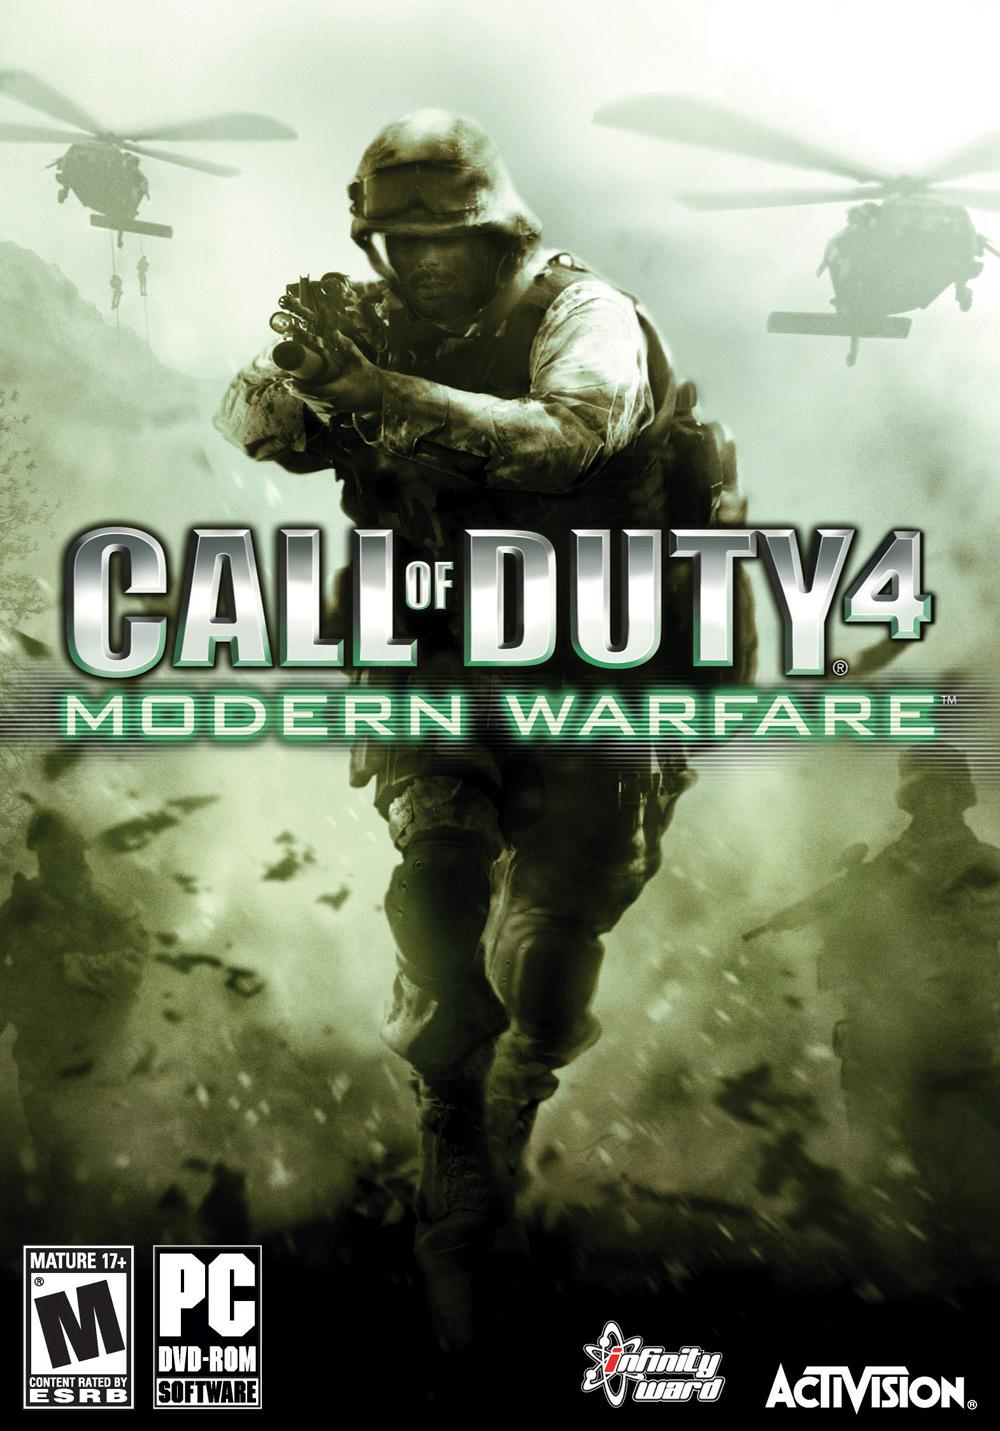 Call of Duty 4: Modern Warfare ile ilgili görsel sonucu